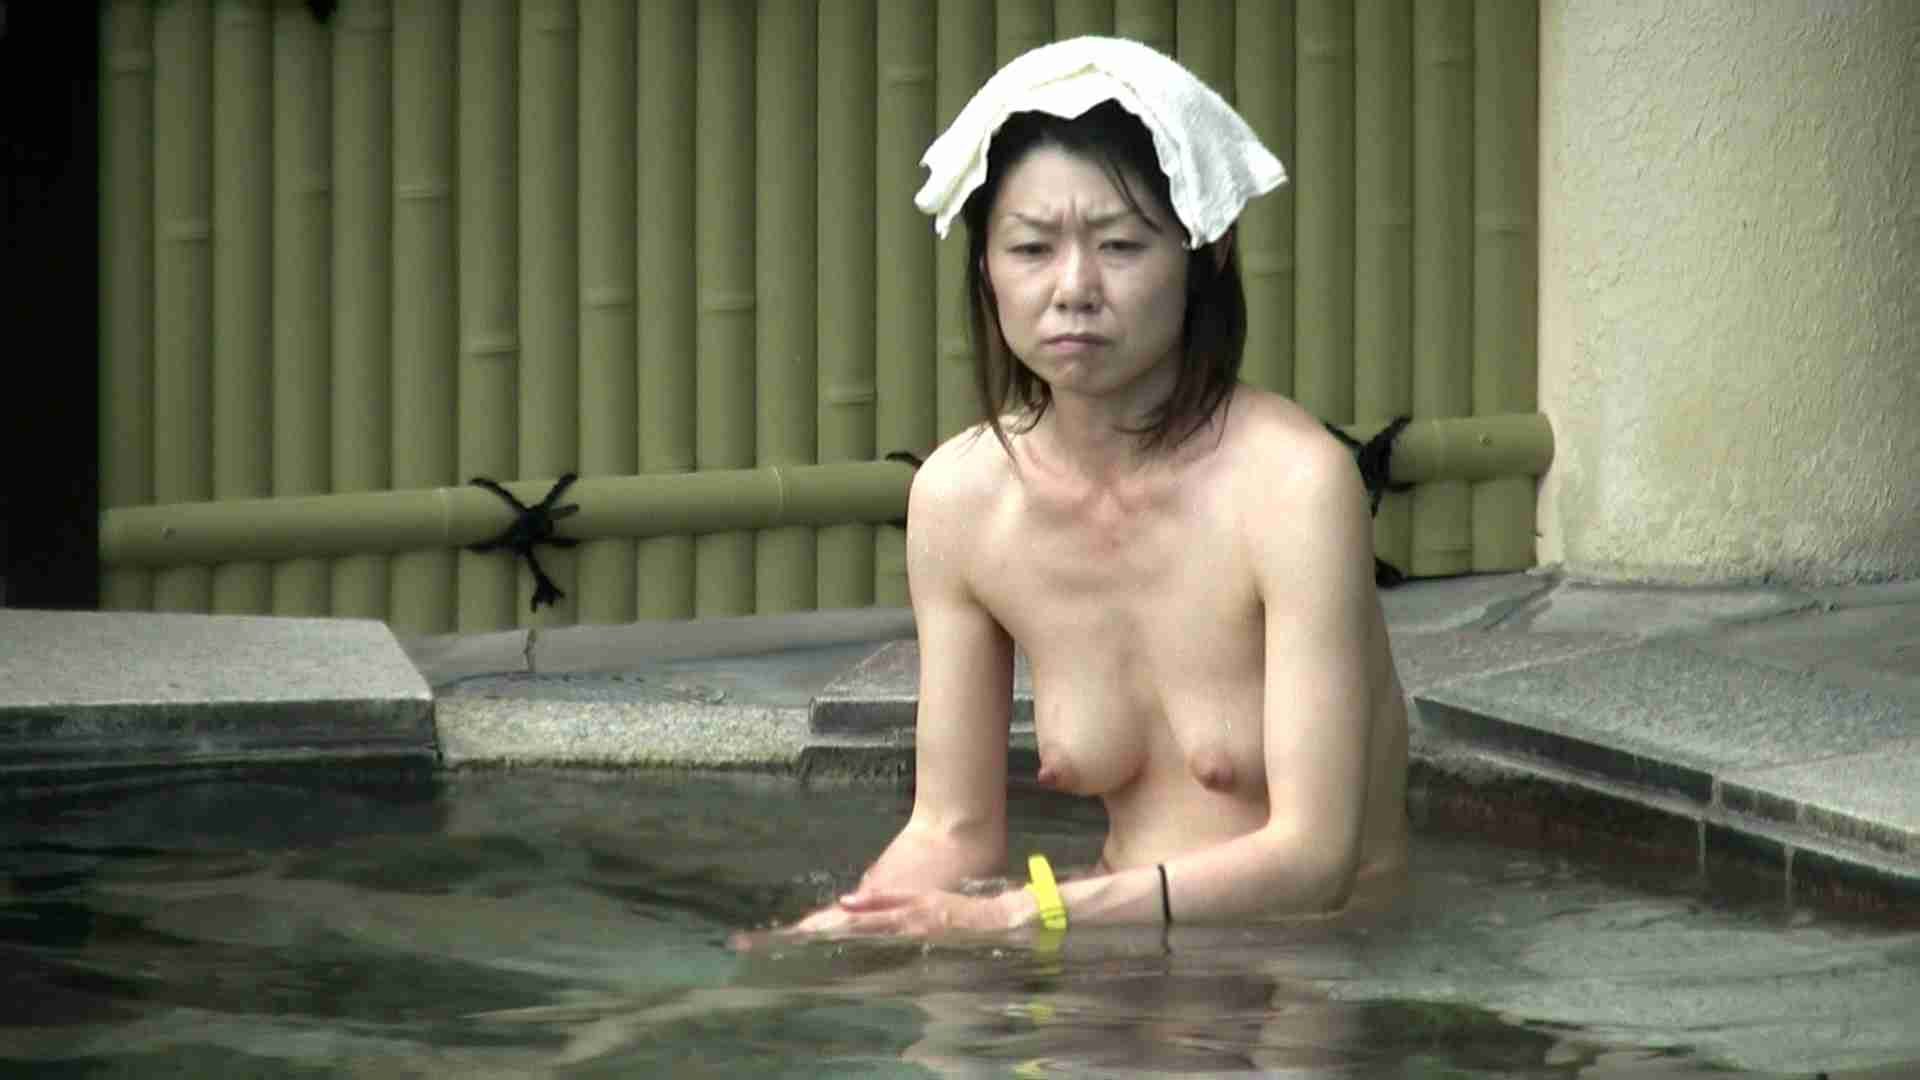 Aquaな露天風呂Vol.658 OLのプライベート  11pic 3